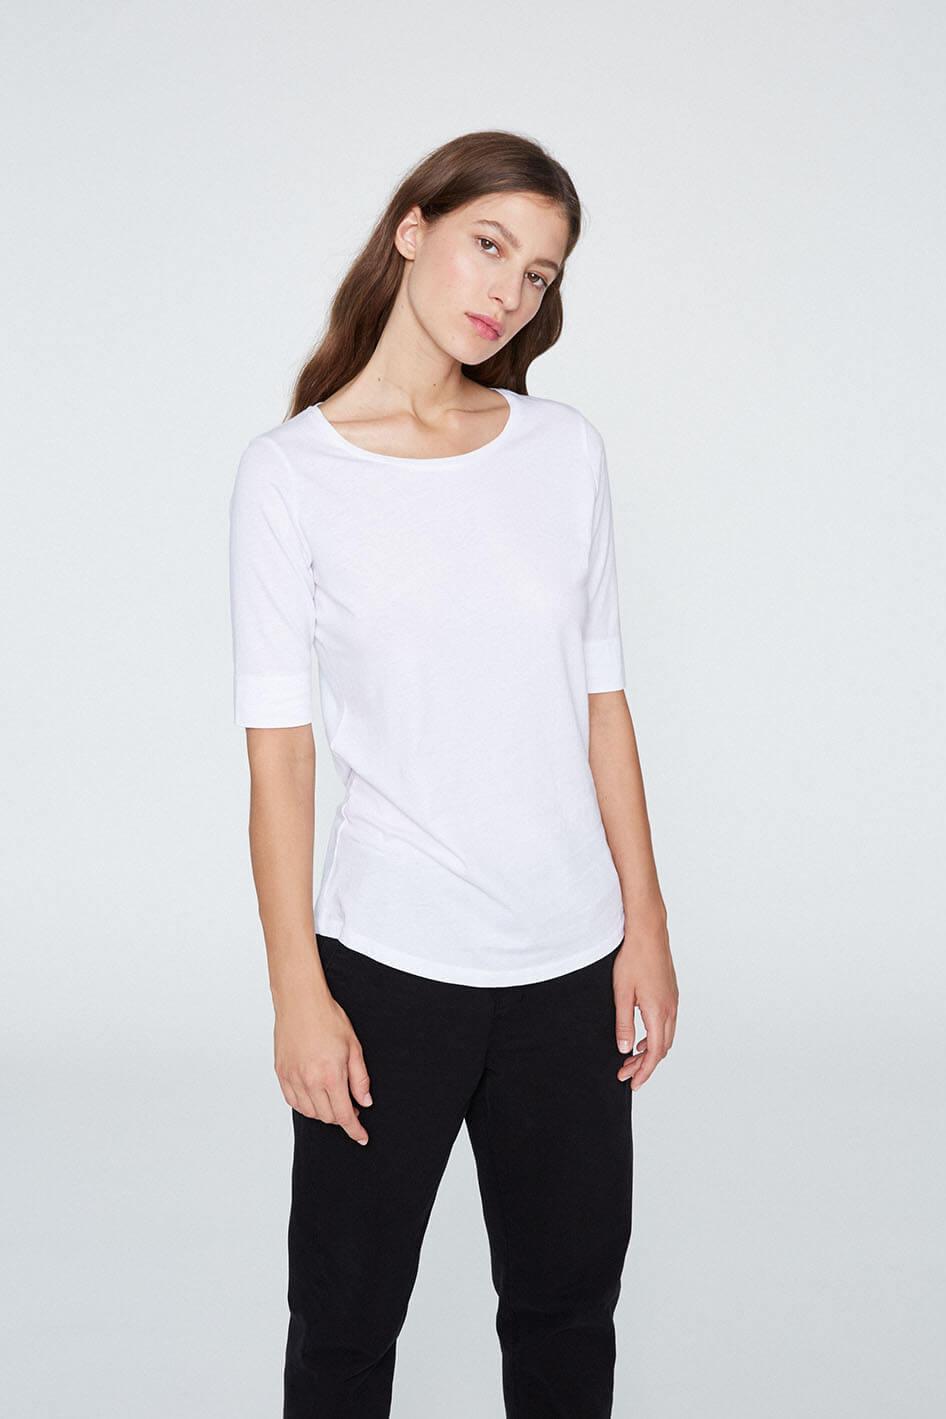 T-Shirt Jannaa Weiss from LOVECO